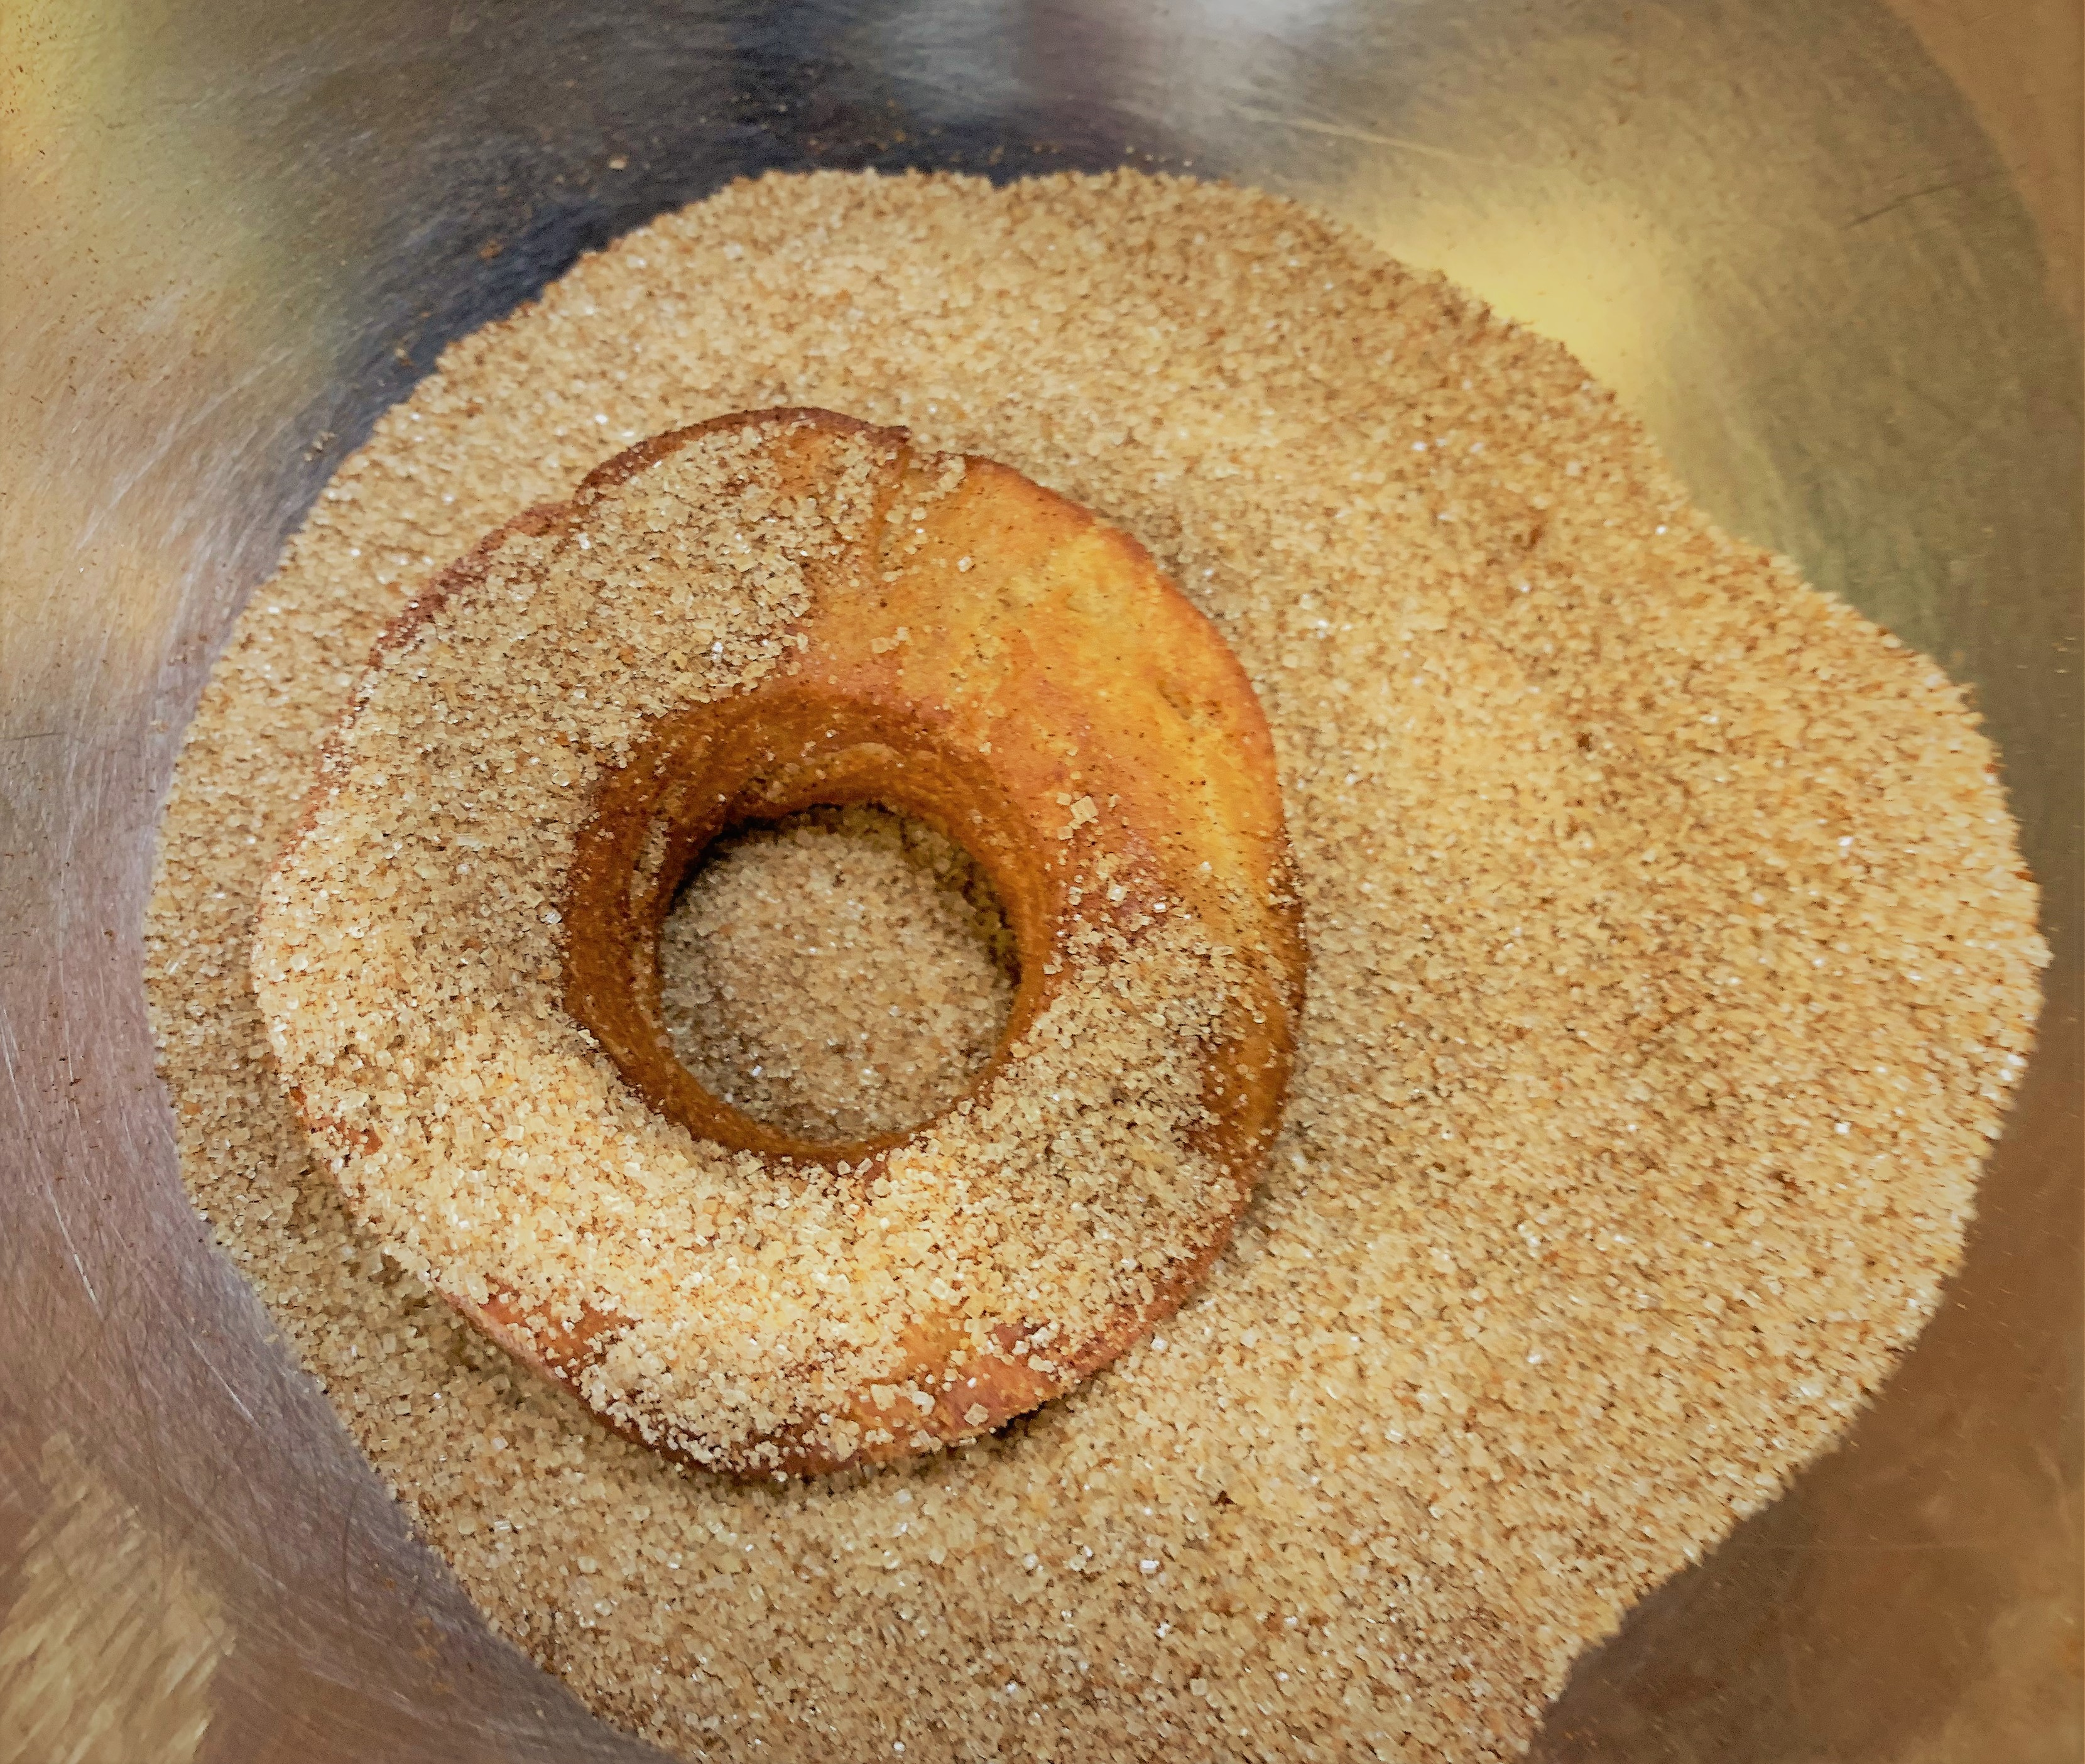 Tossing the doughnuts in cinnamon sugar